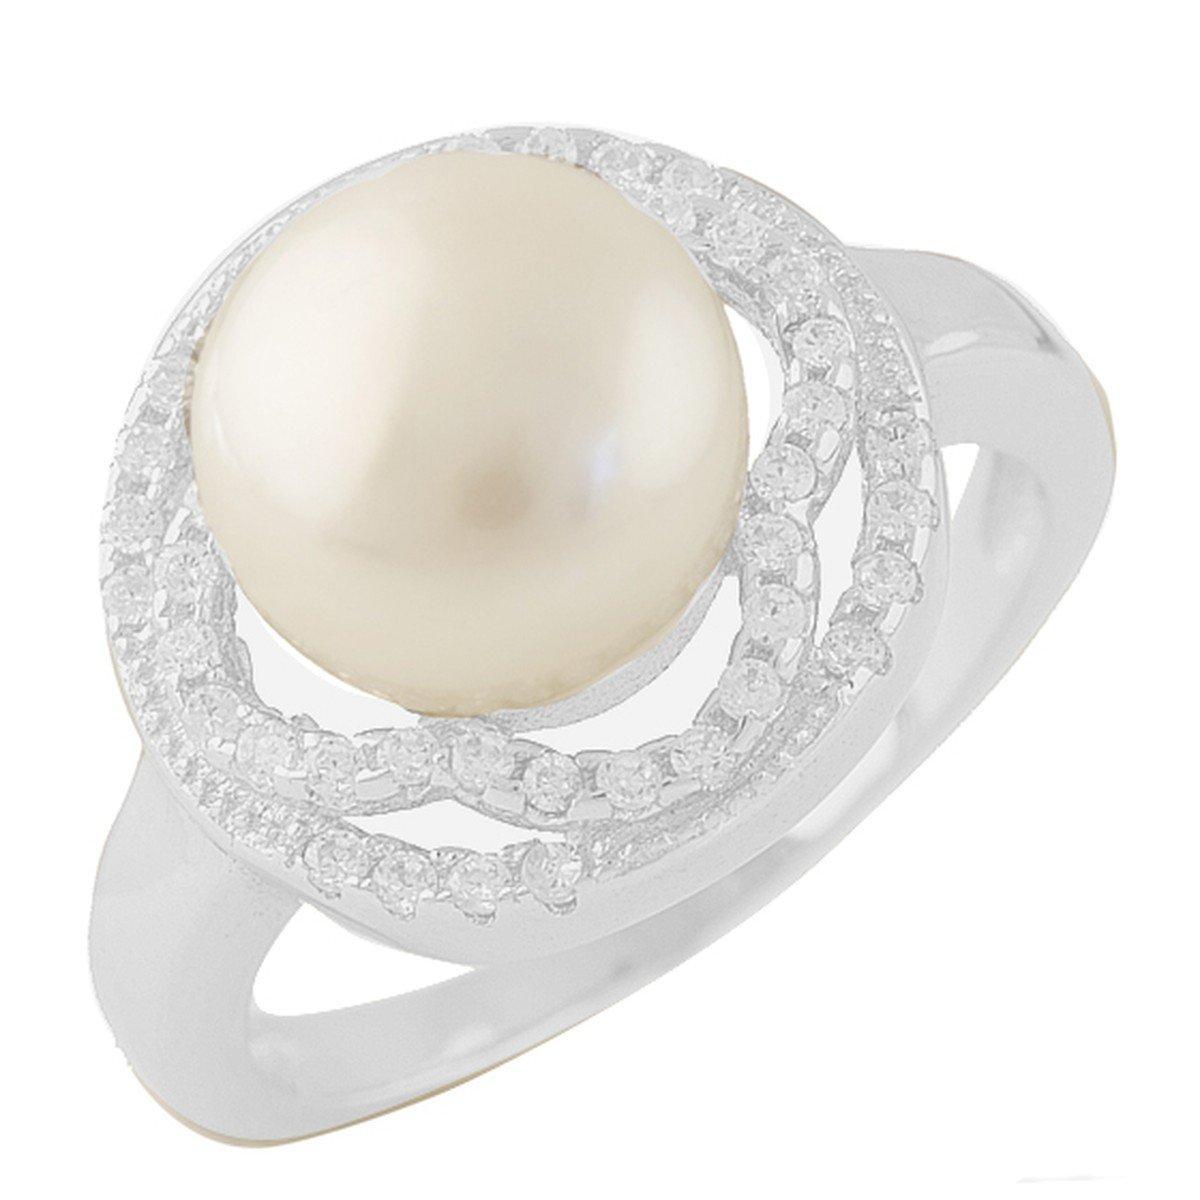 Серебряное кольцо DreamJewelry с натуральным жемчугом (1404218) 17.5 размер